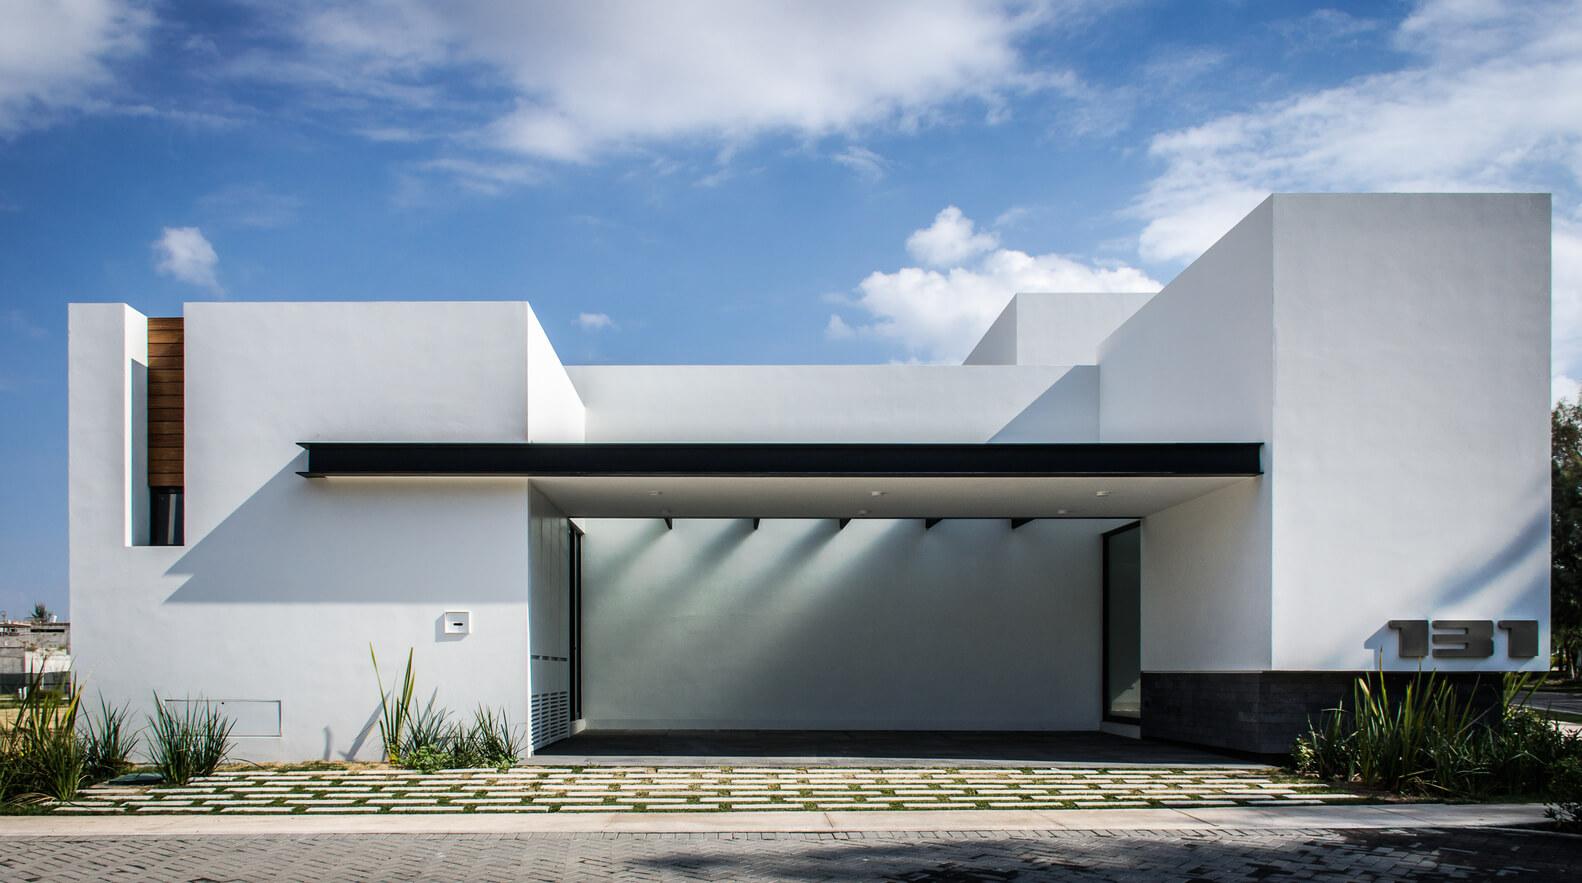 16 fachadas modernas diganas de imitar interiores Imagenes de disenos de interiores de casas